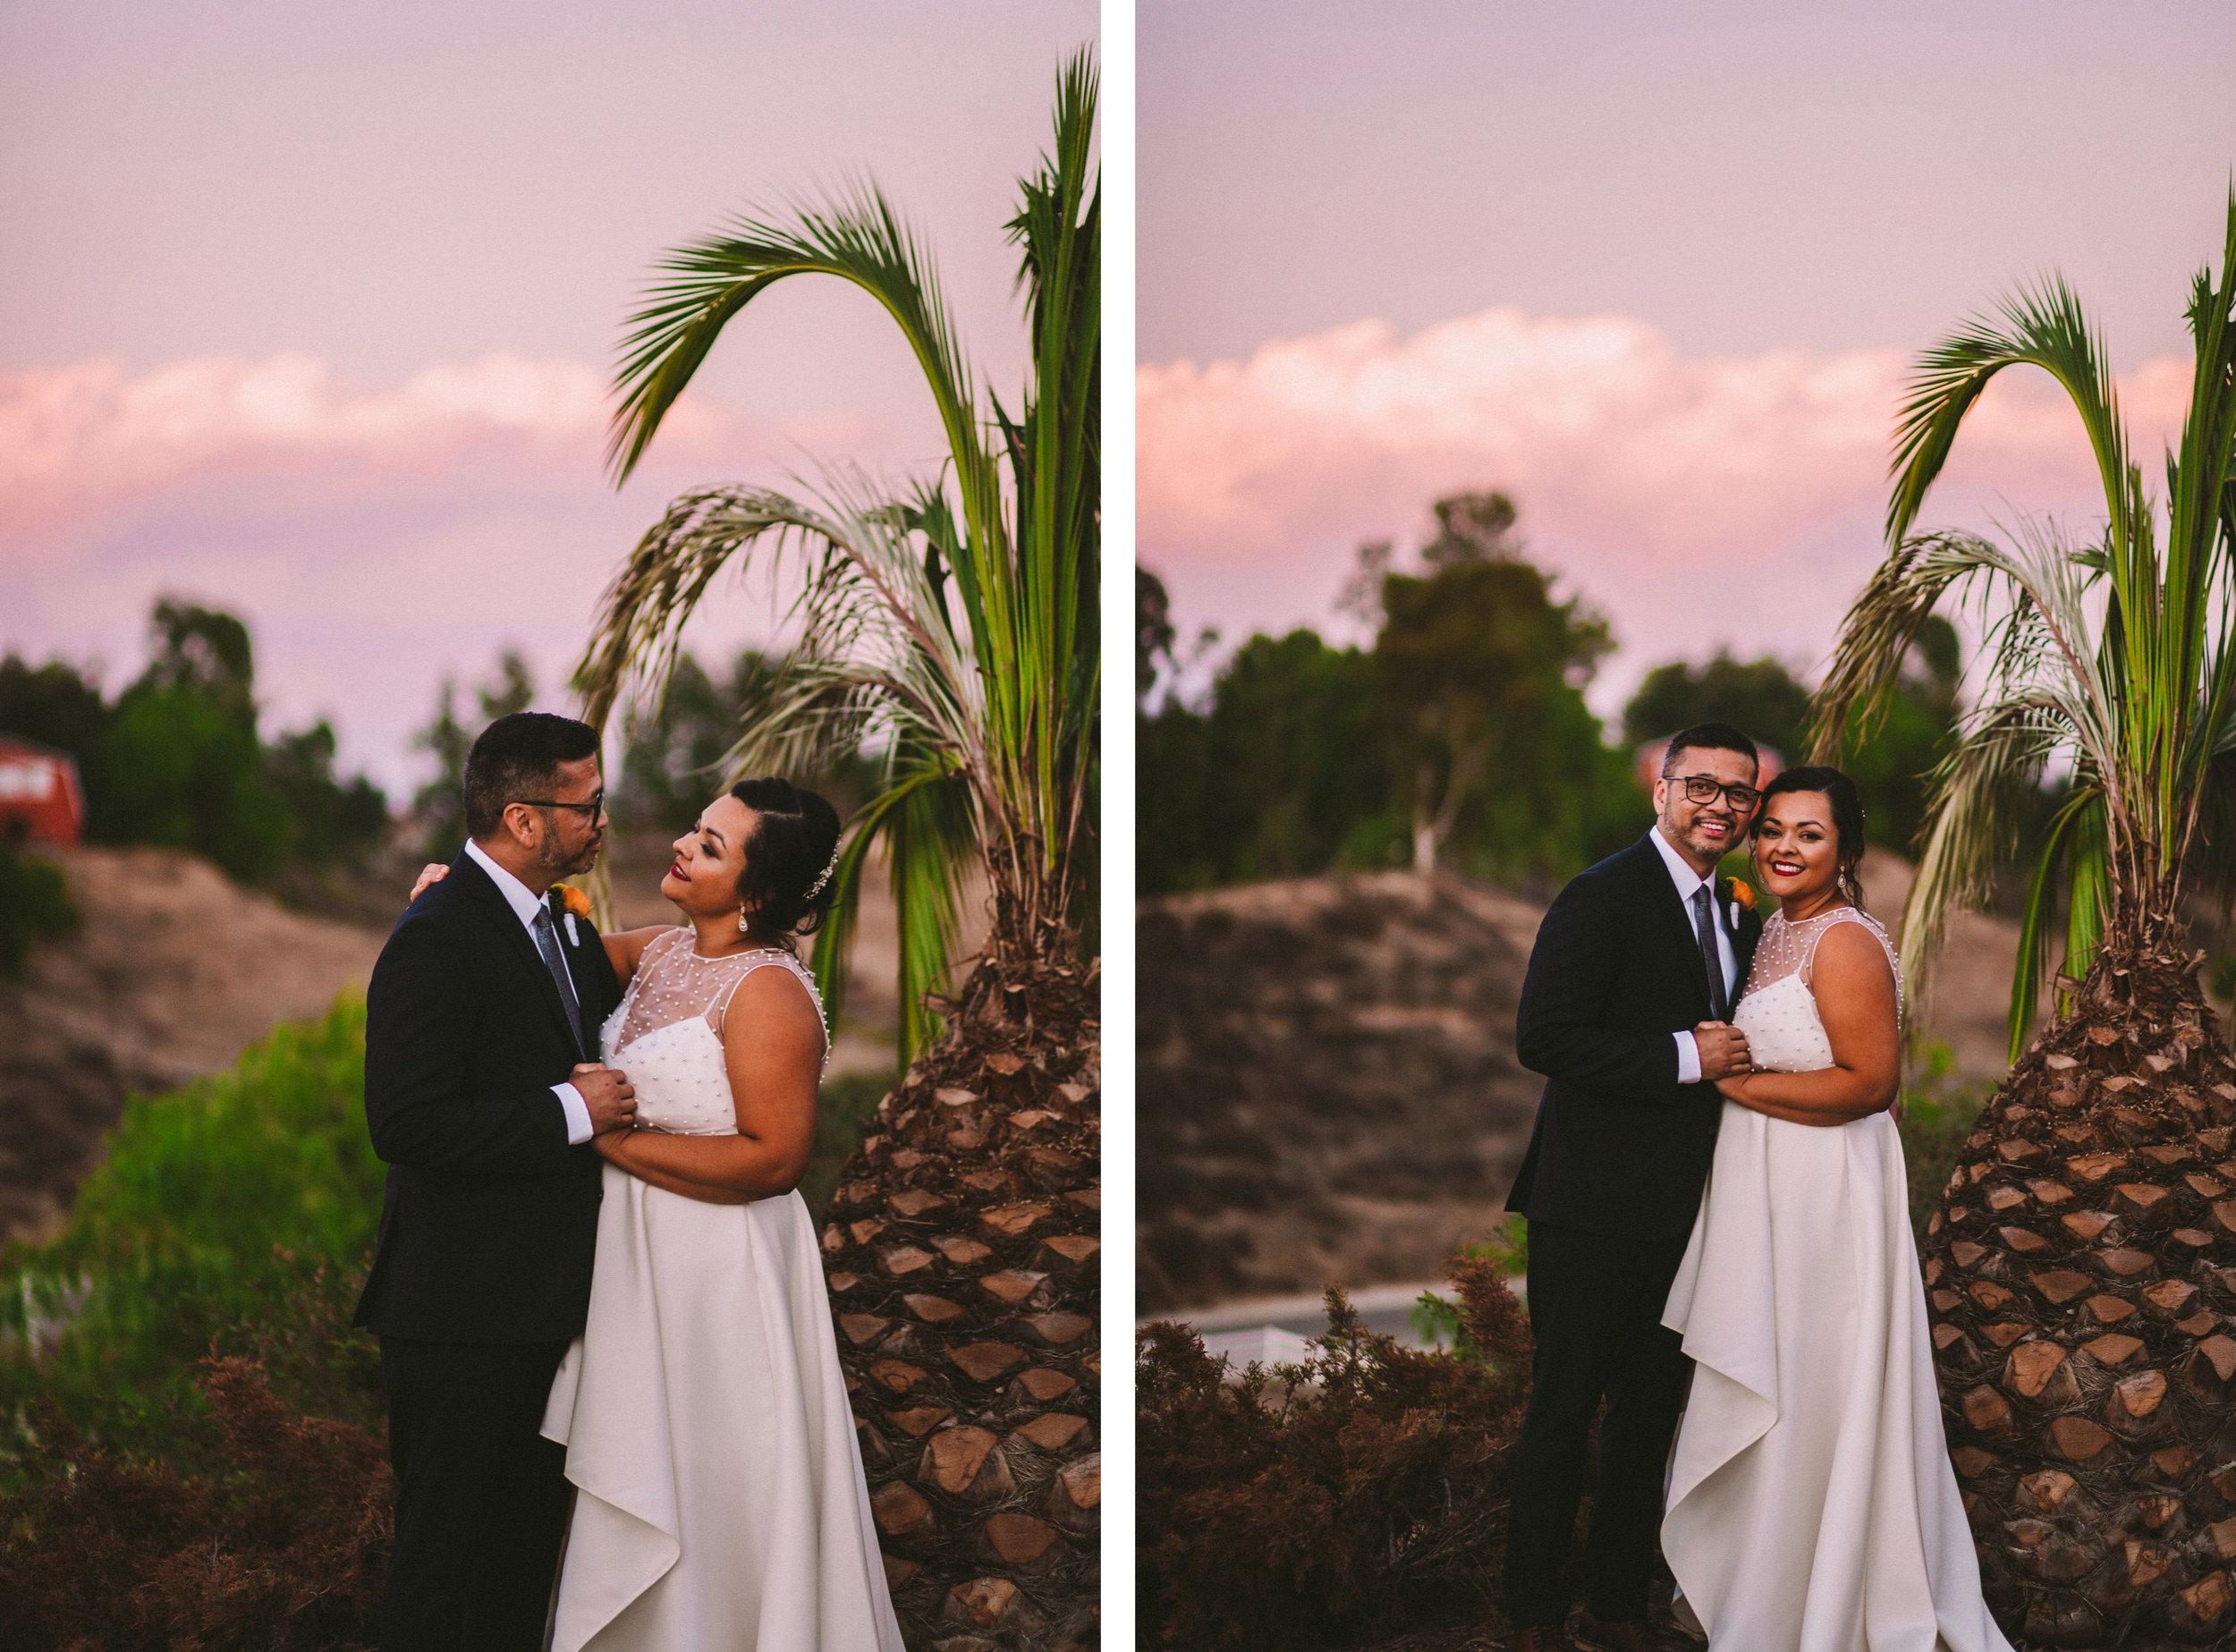 Intimate & colorful Temecula Documentary Wedding Photography-92.jpg